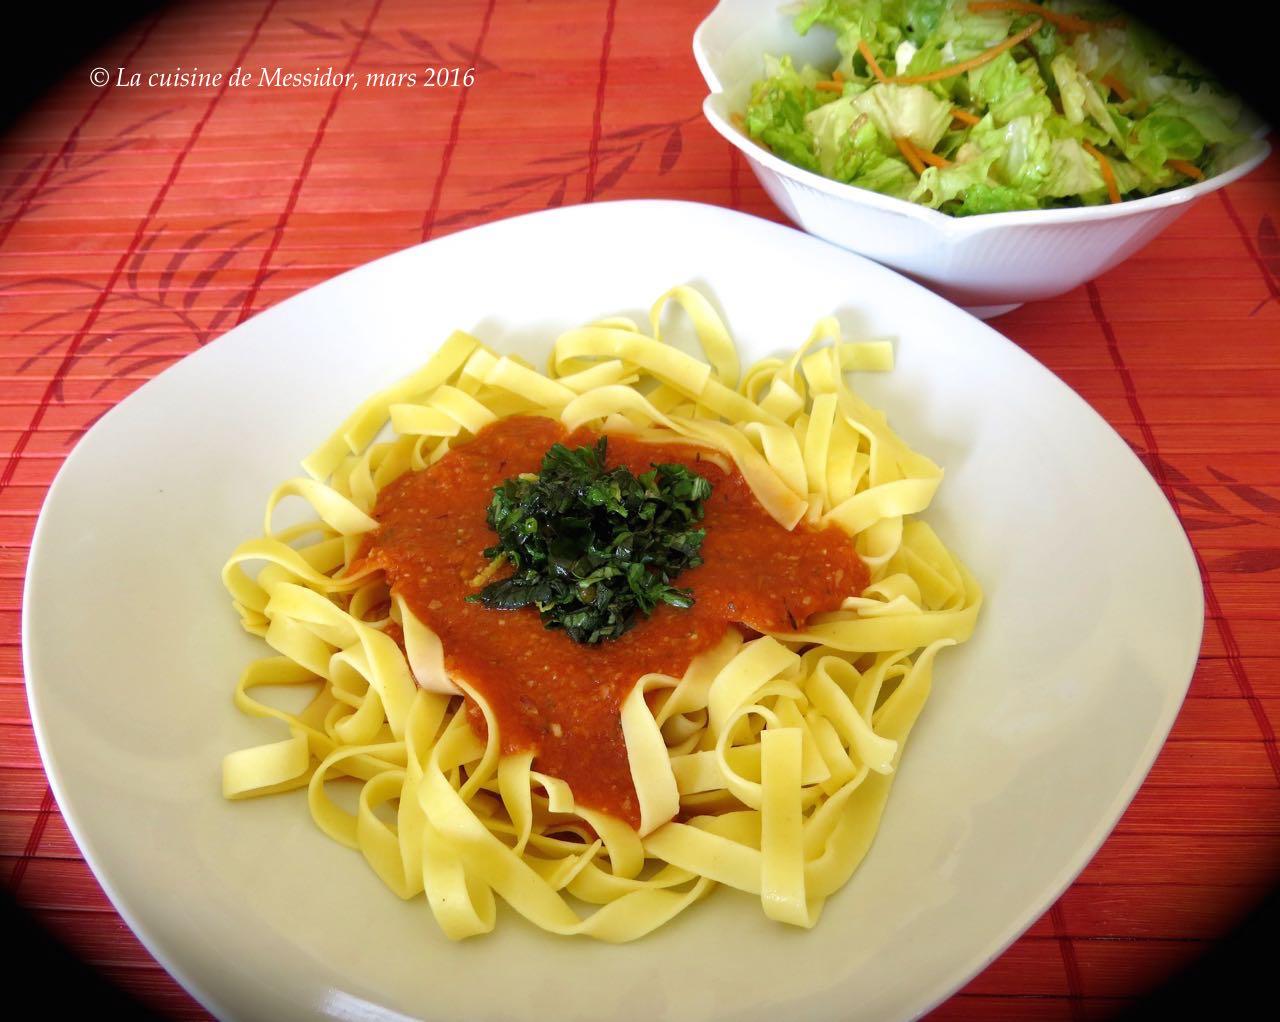 La cuisine de messidor sauce tomate express style romesco for Sauce tomate cuisinee